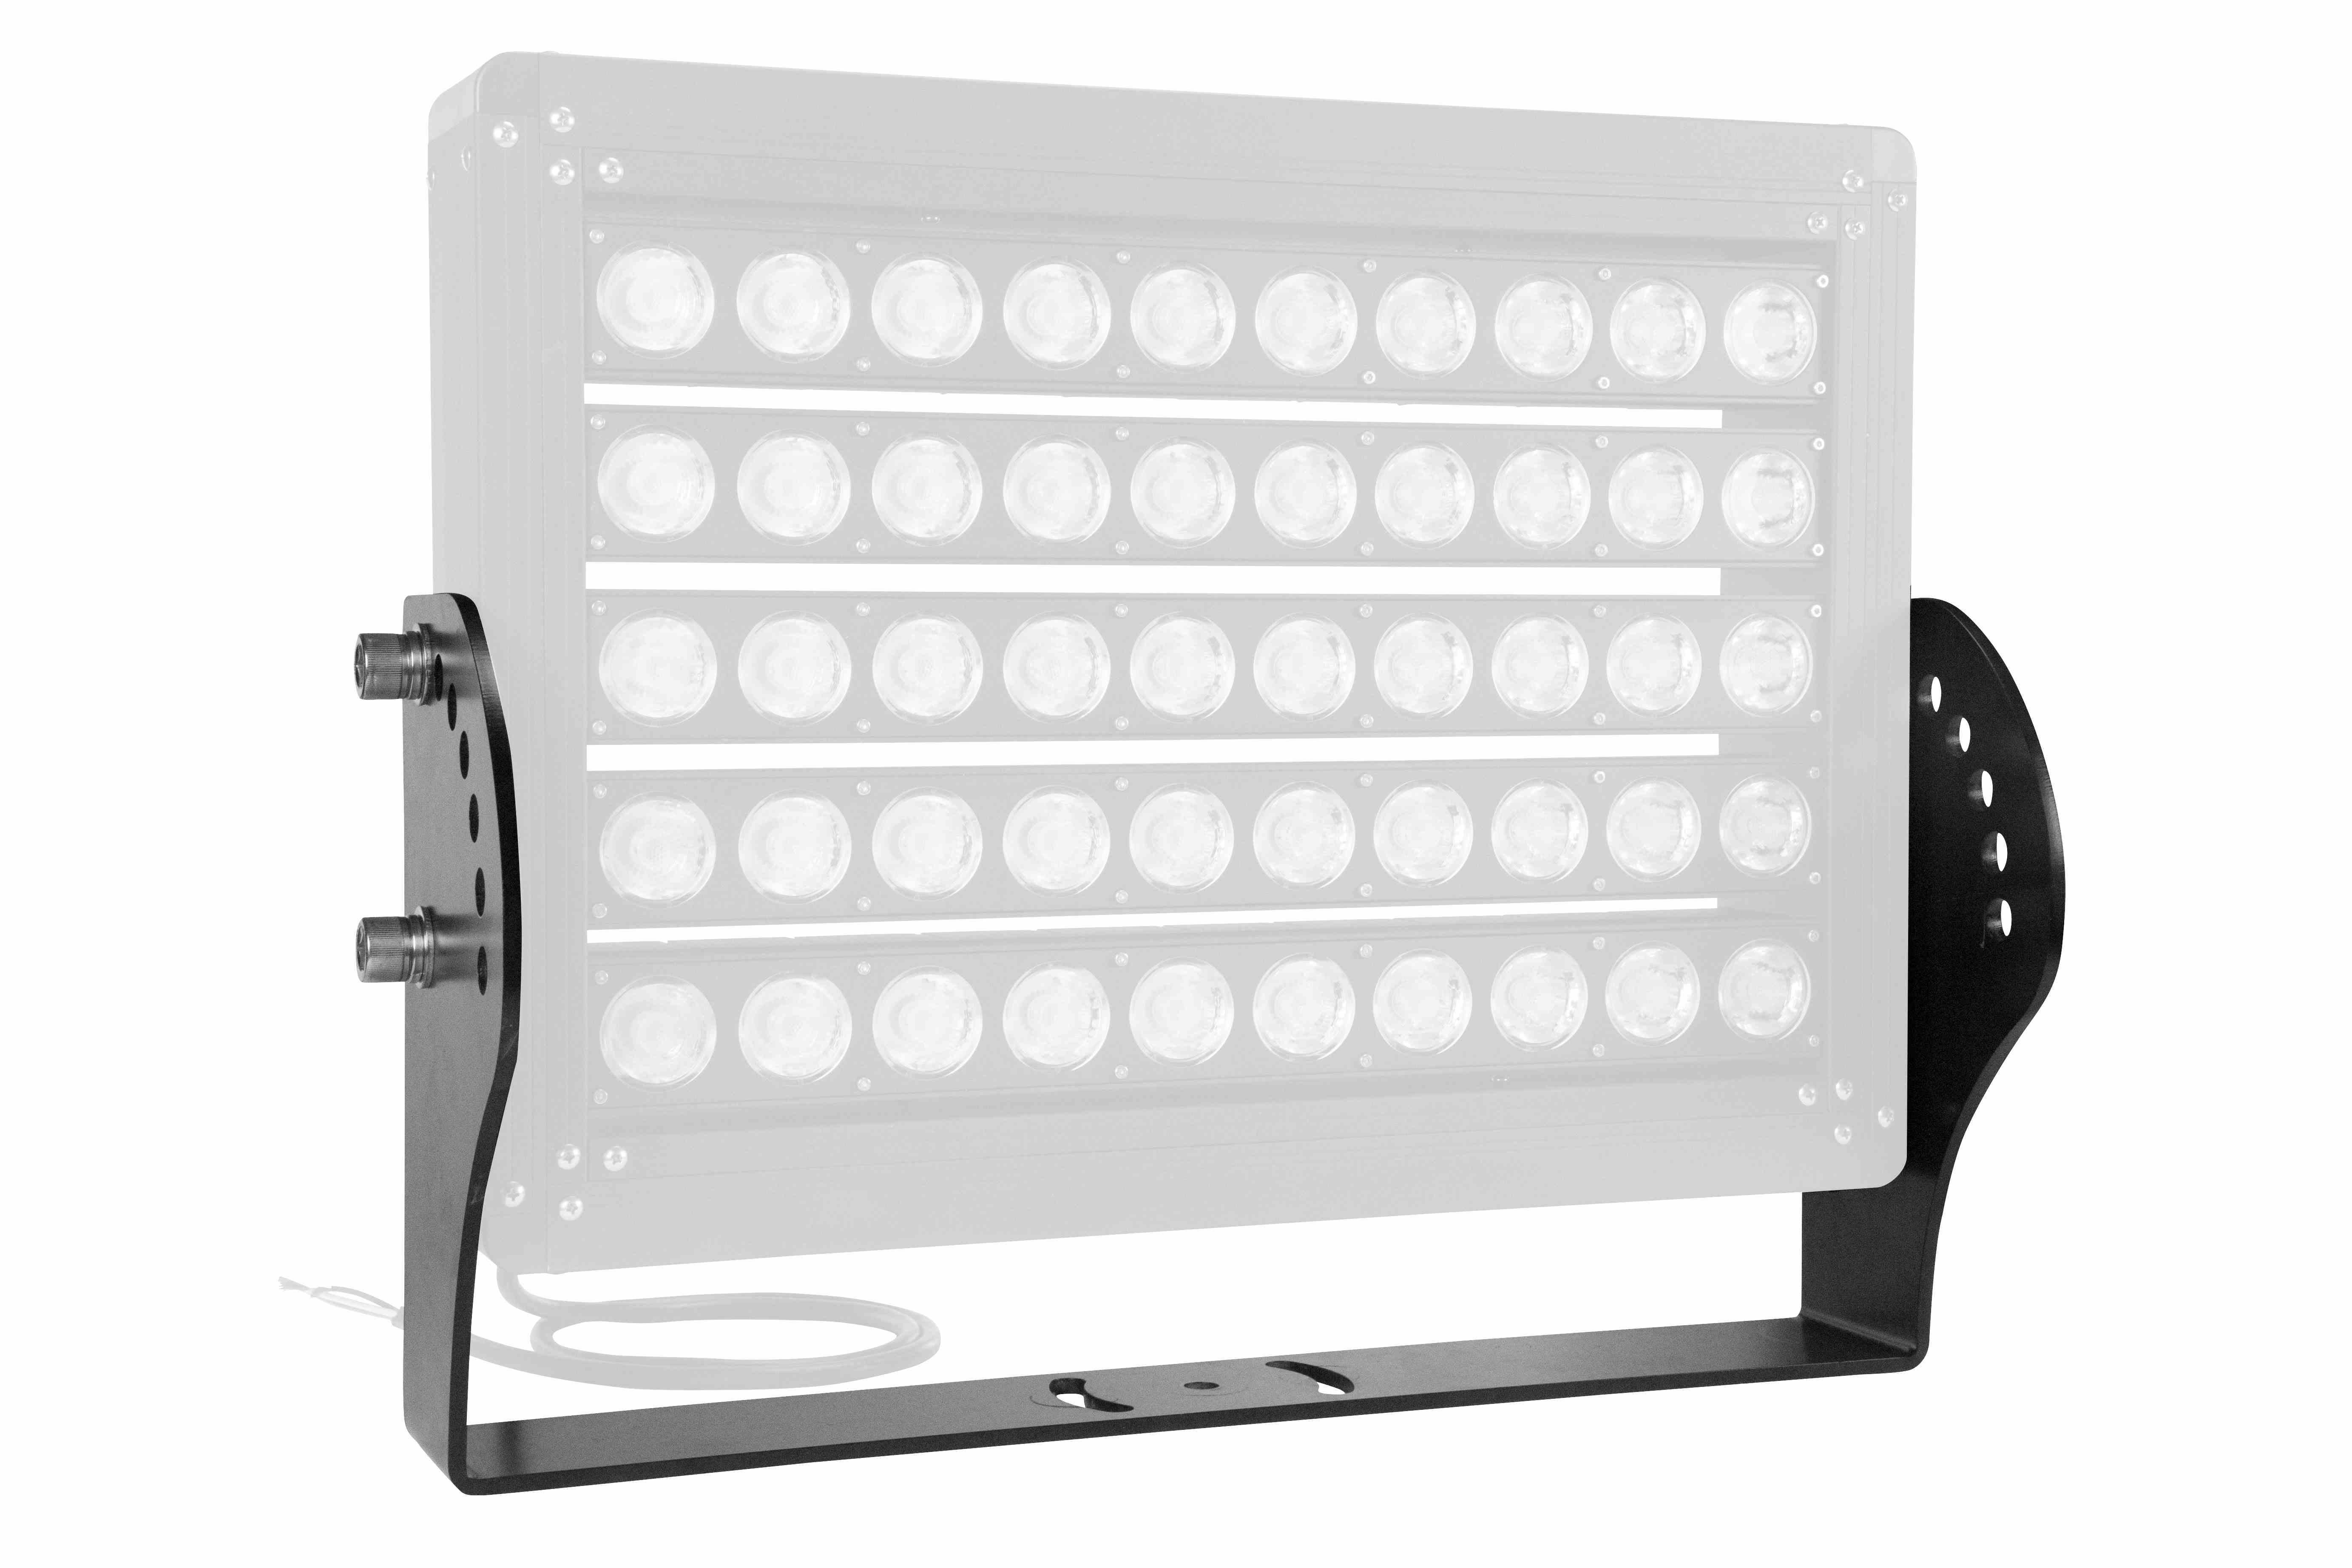 Replacement Trunnion U-Bracket For GAU-LTL-500W-LED Series LED Lights